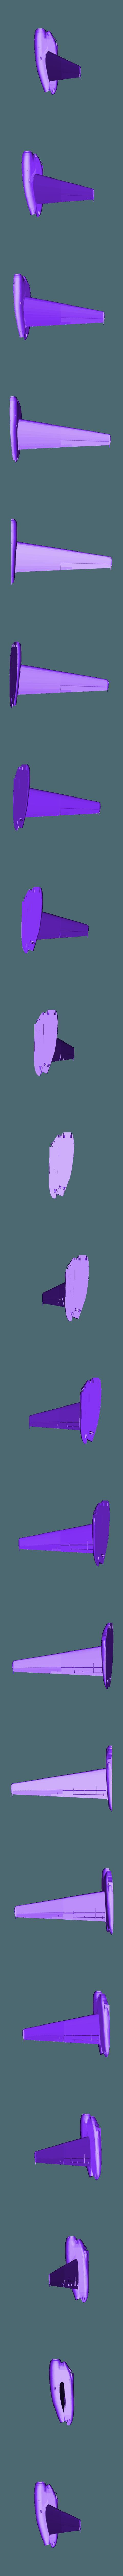 AN-32_wingR1_out.stl Download free STL file Antonov An-32 • Template to 3D print, AVIZO